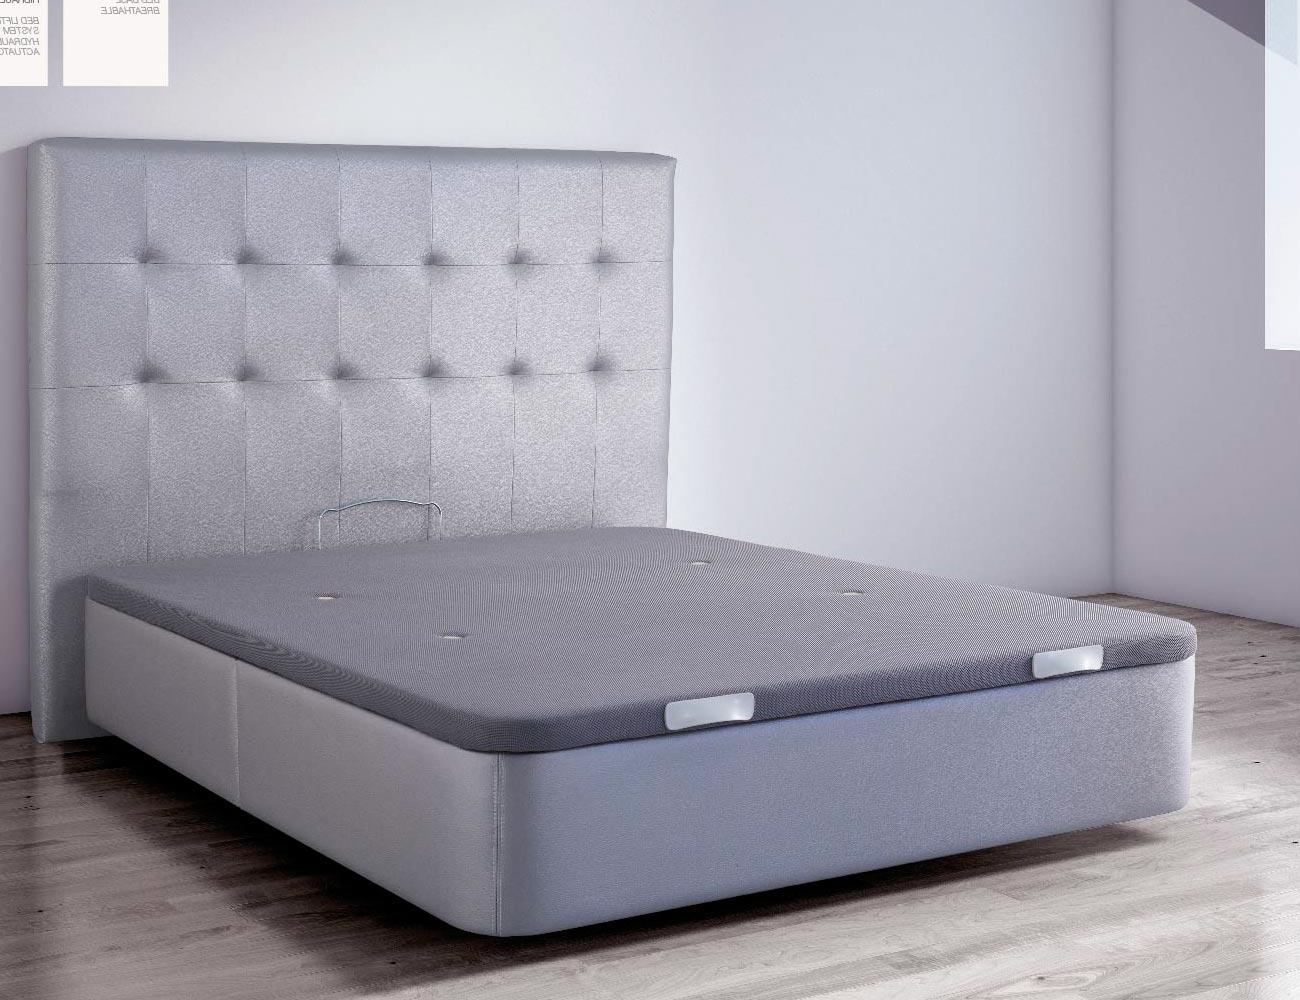 canap tapizado en polipiel color plata con tapa. Black Bedroom Furniture Sets. Home Design Ideas